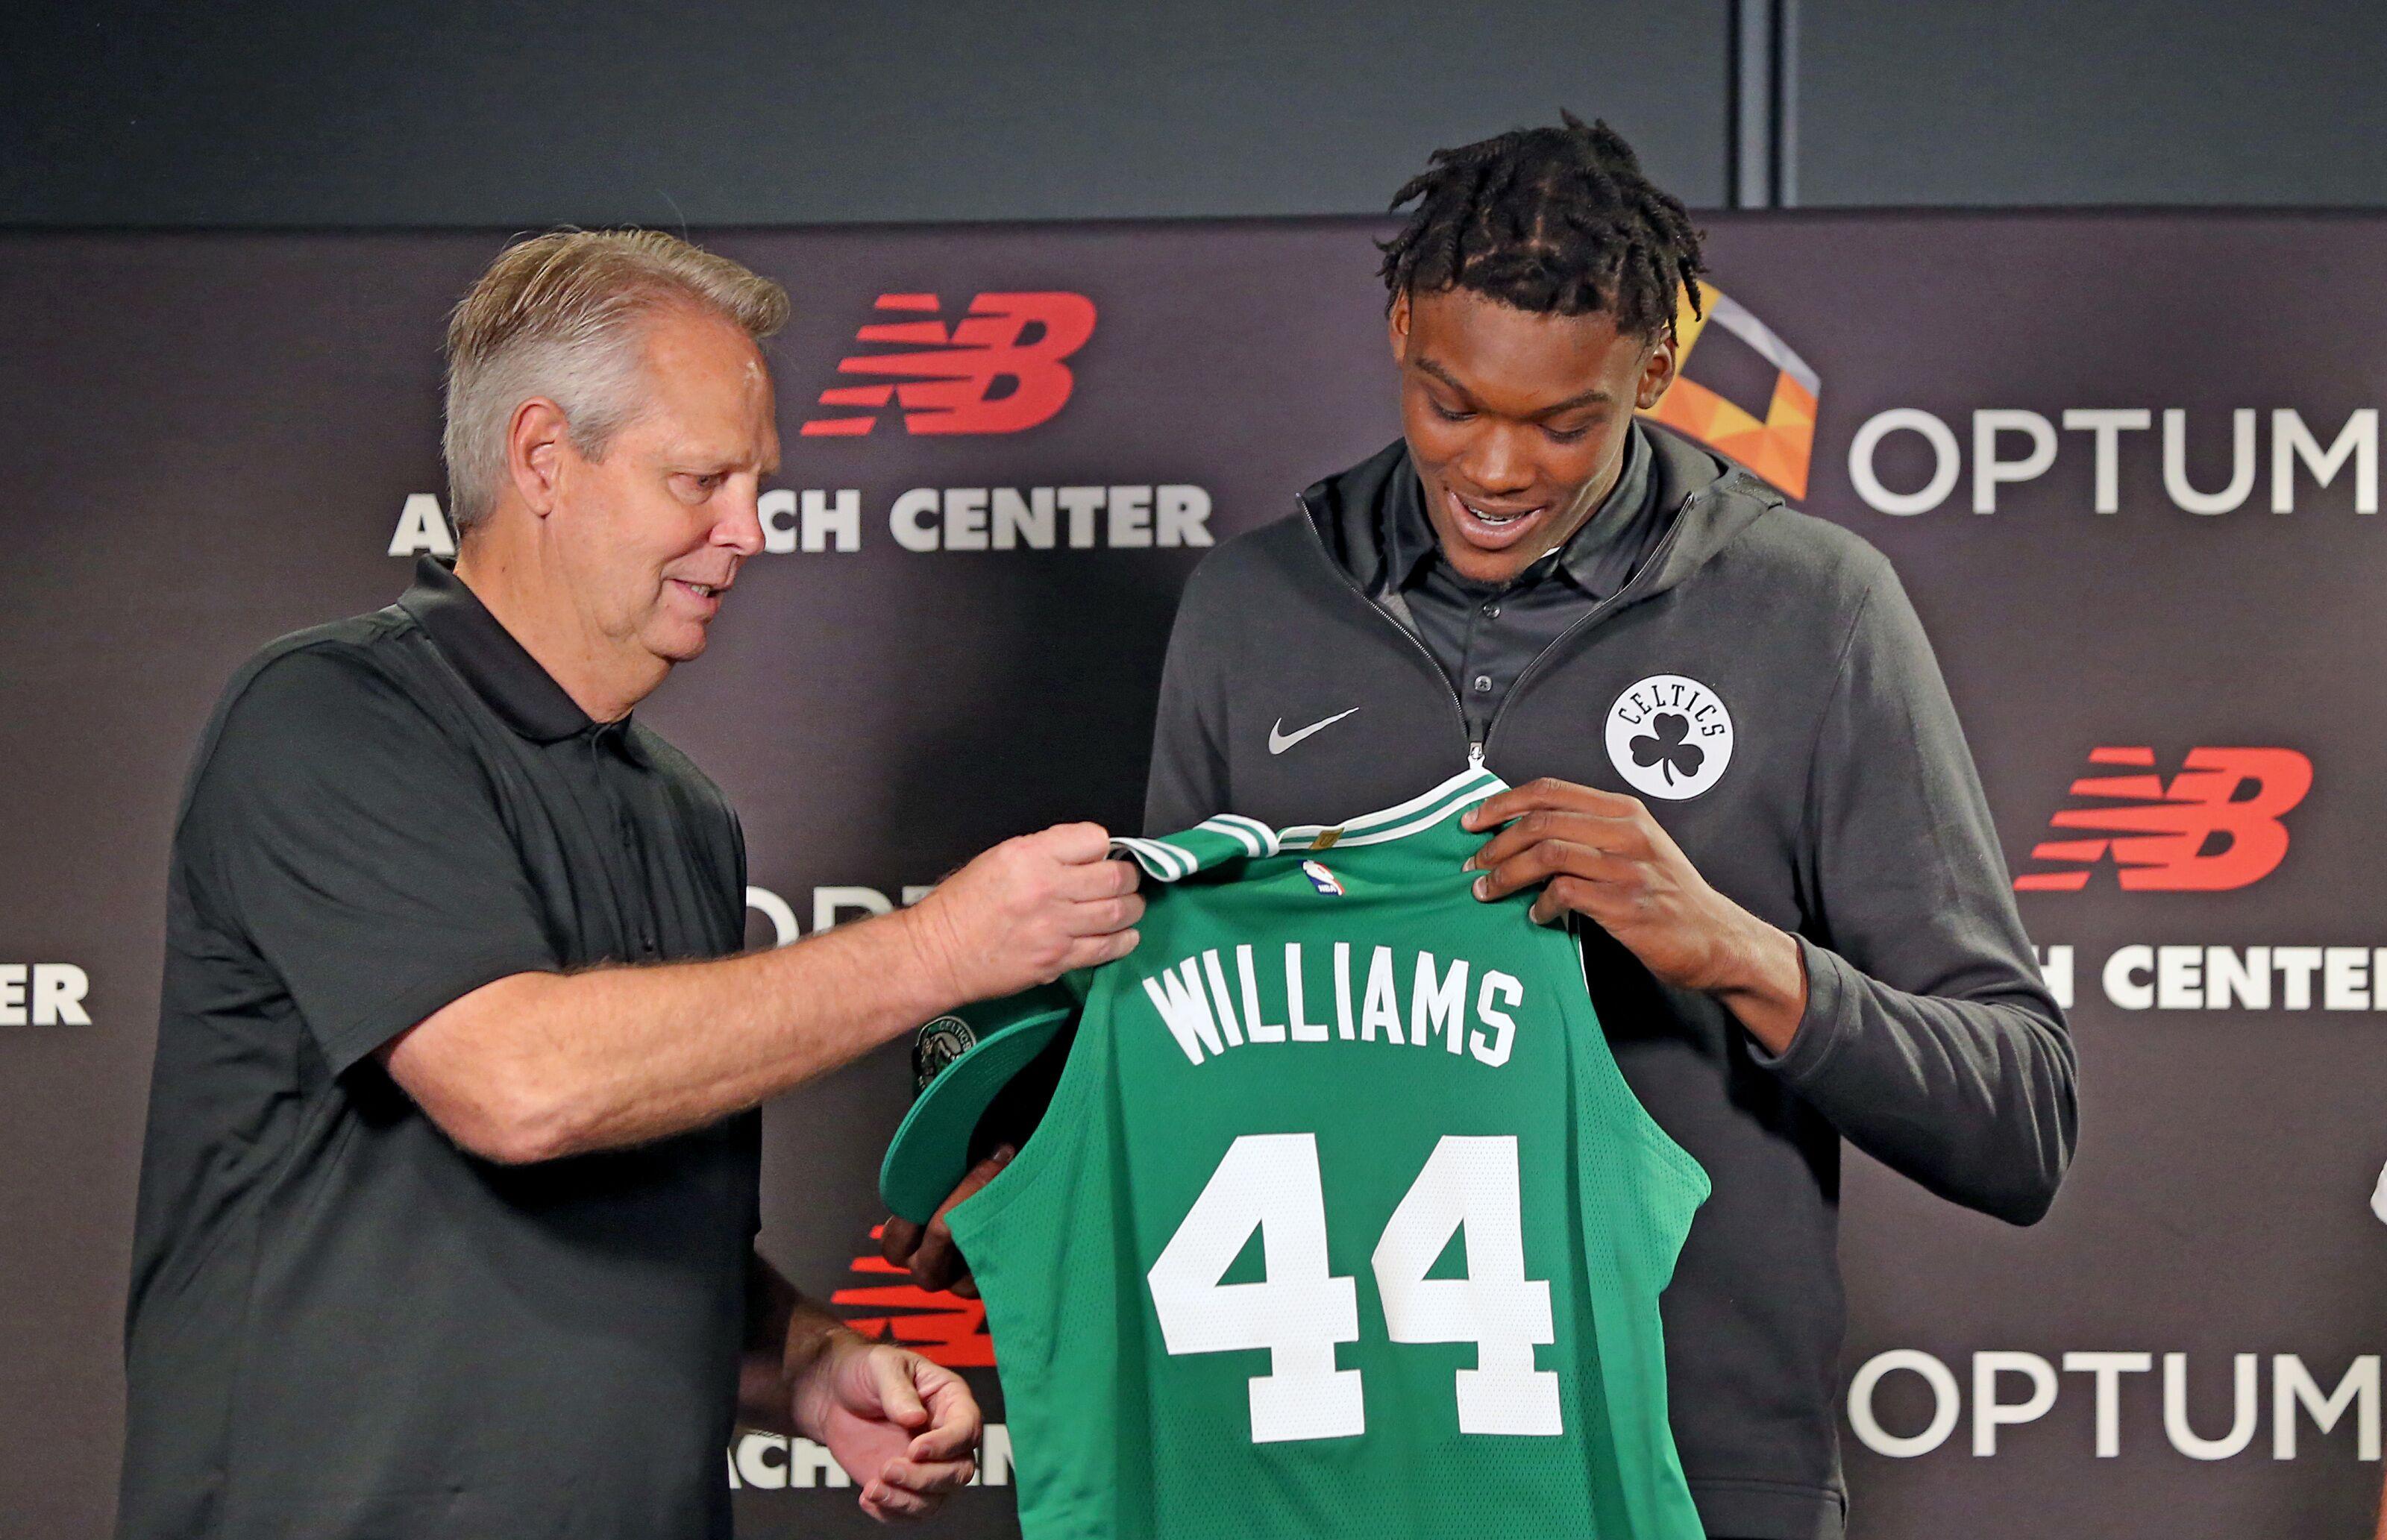 2018 Boston Celtics Draft Rewind: The Time Lord has Landed